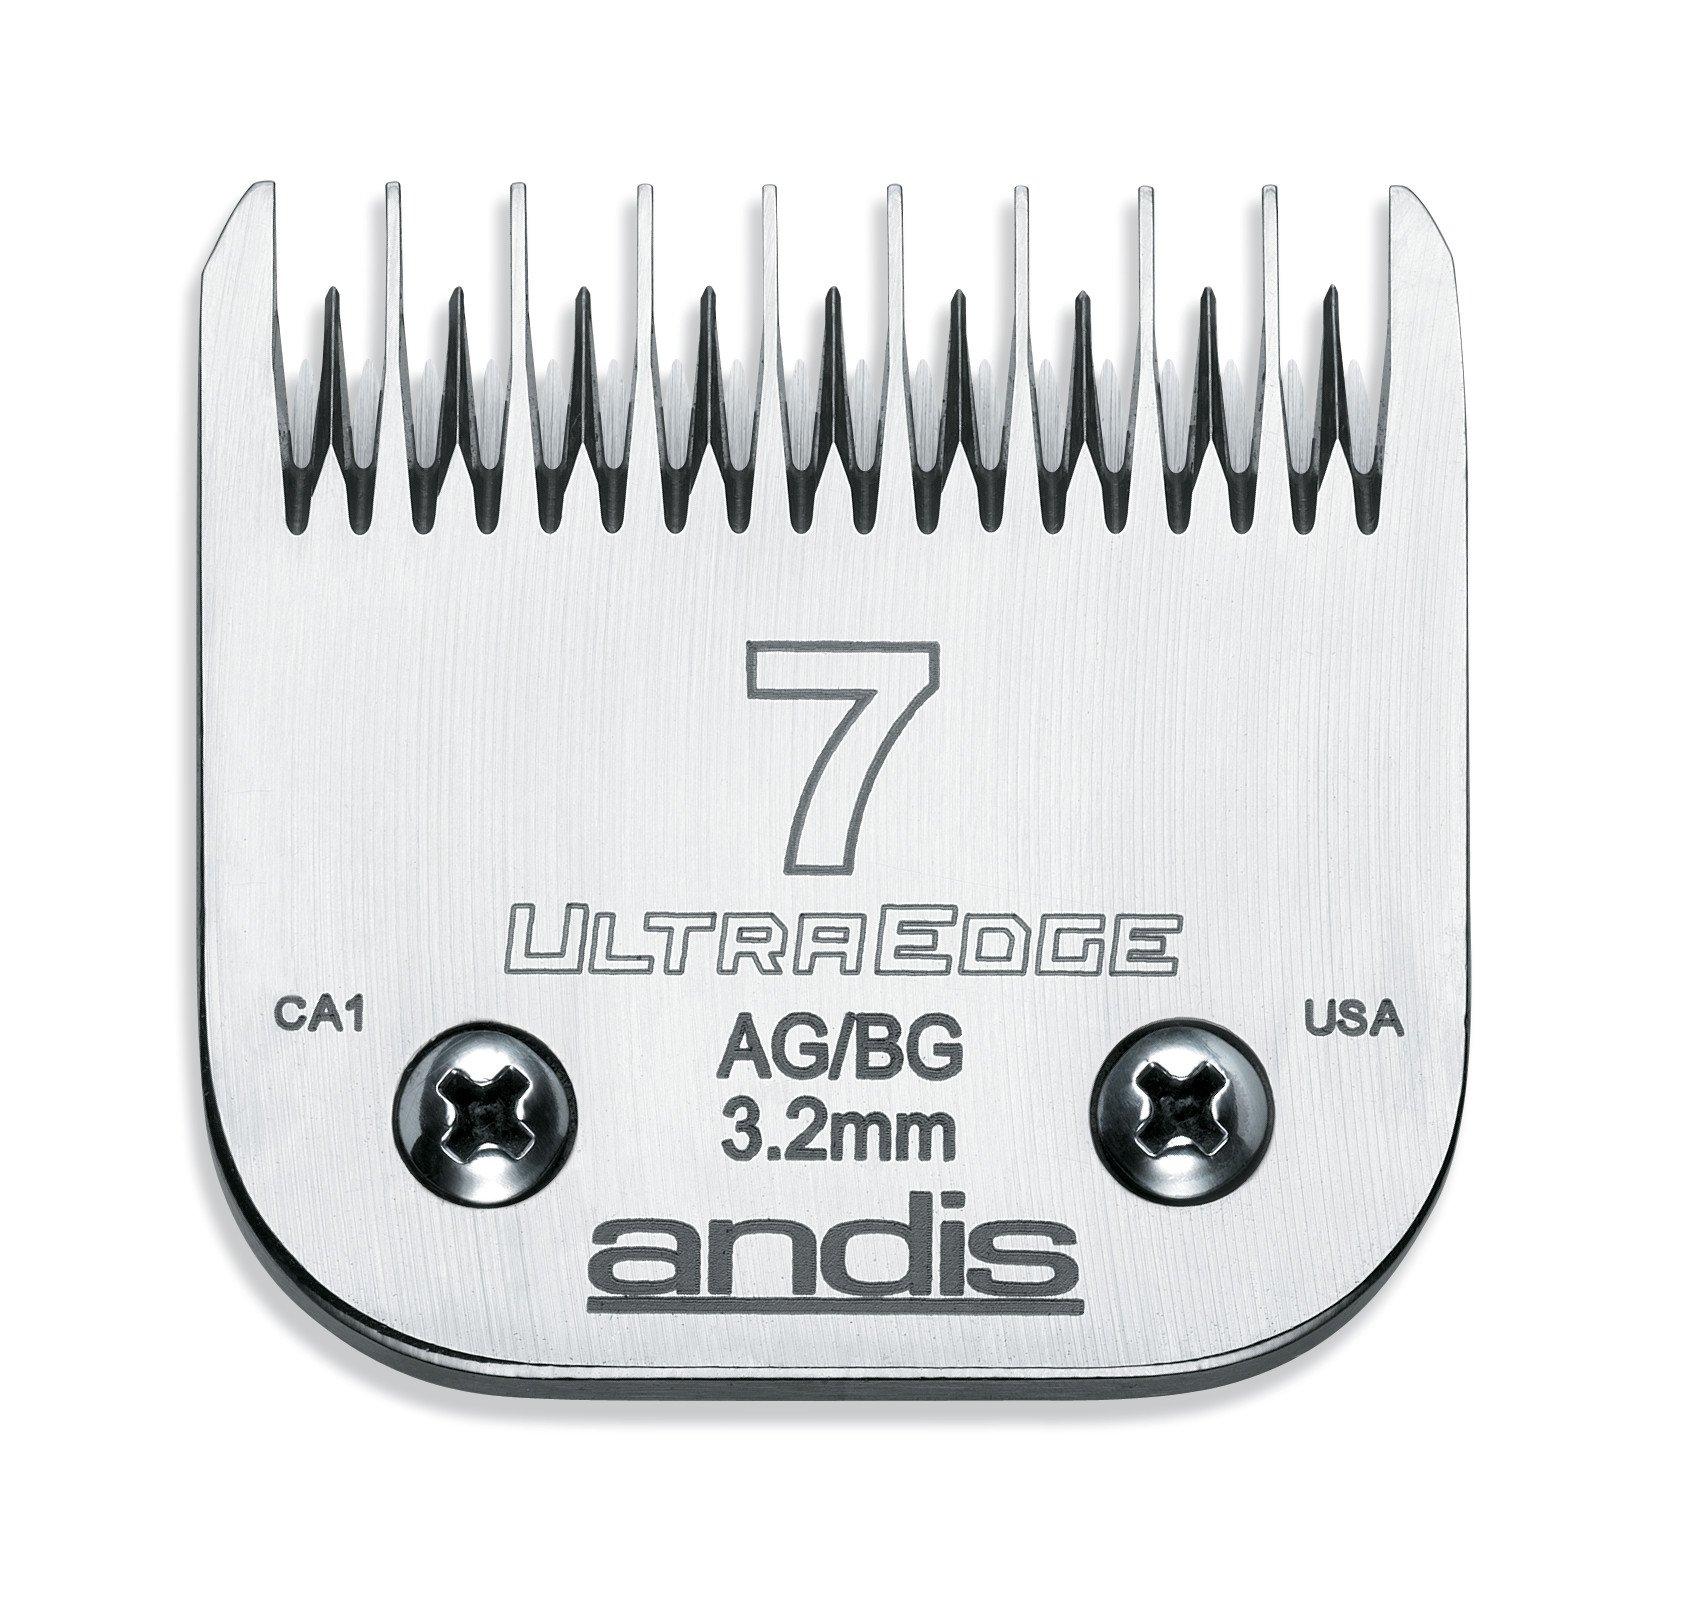 Cuchillas : Andis 7 Ultra Edge 802128 Reemplazo